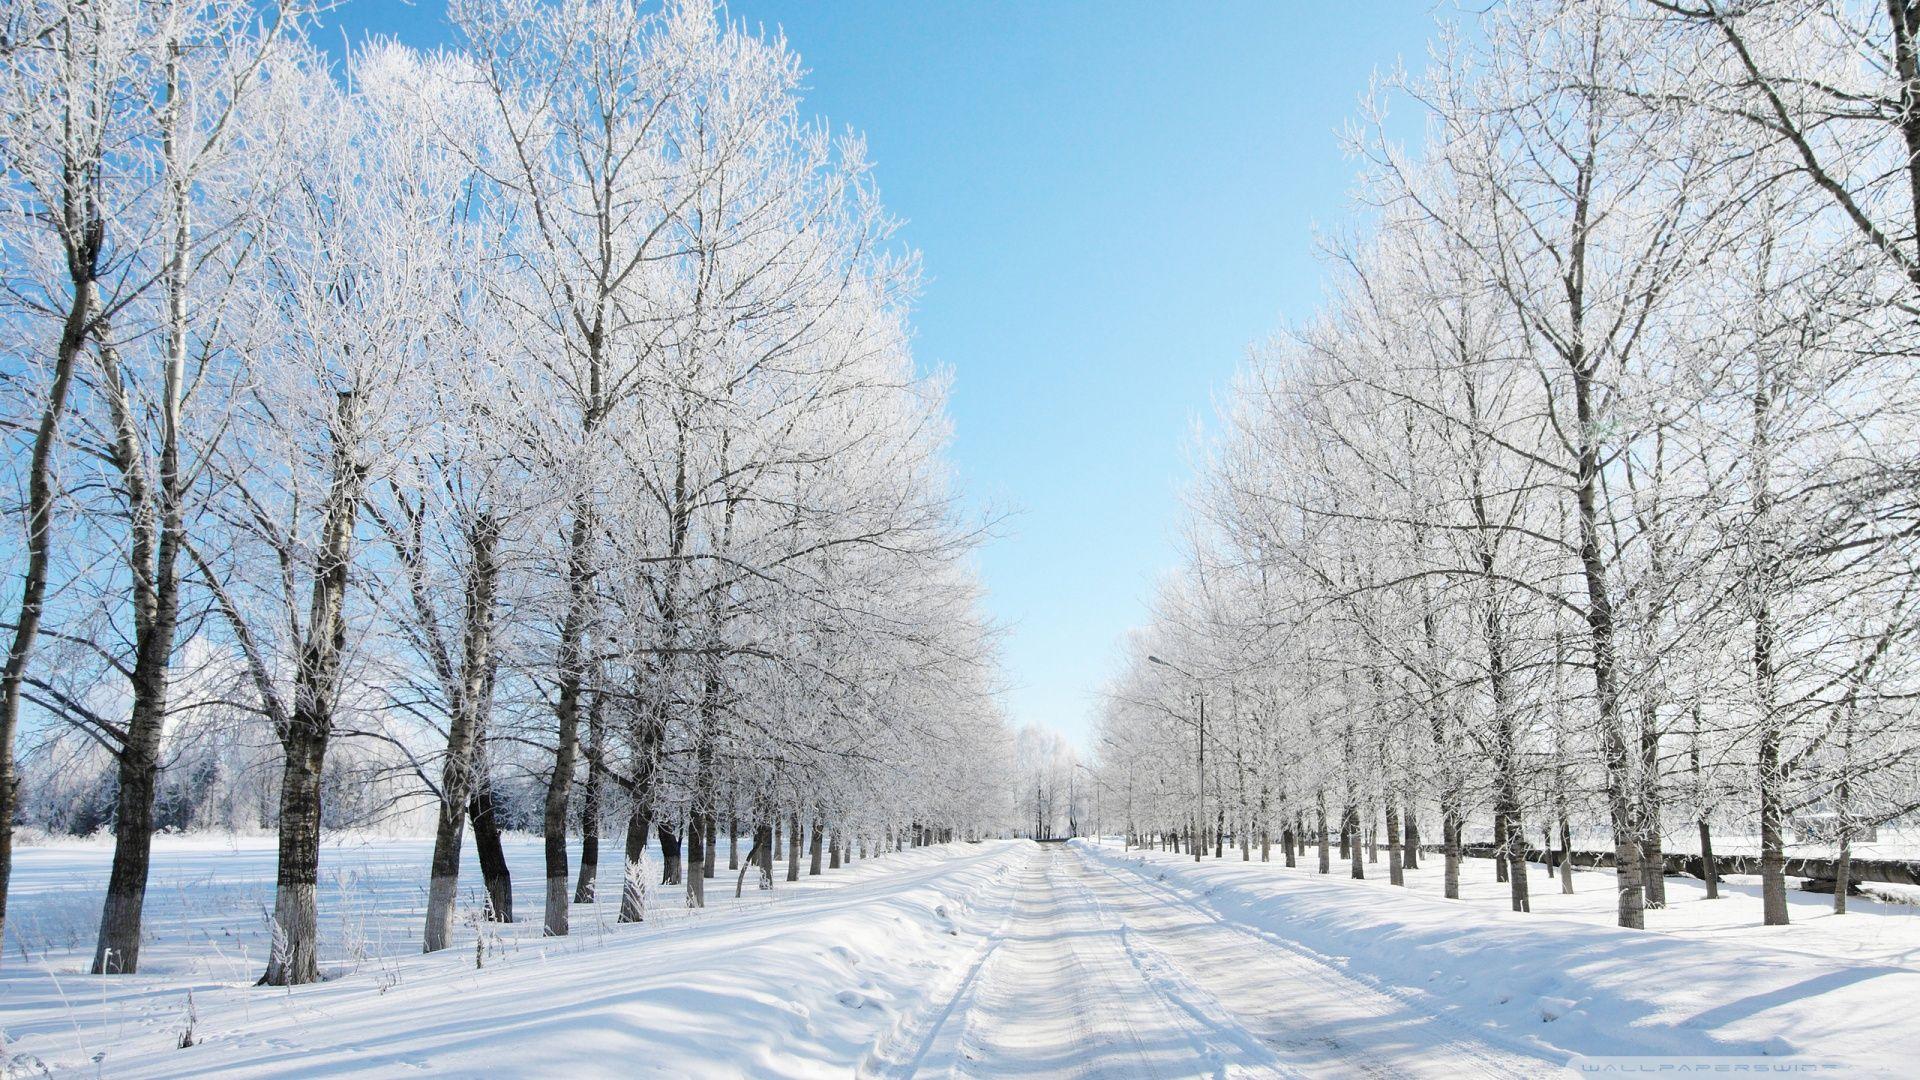 K Ultra HD Snow Wallpapers HD Desktop Backgrounds 19201200 Snow 1920x1080